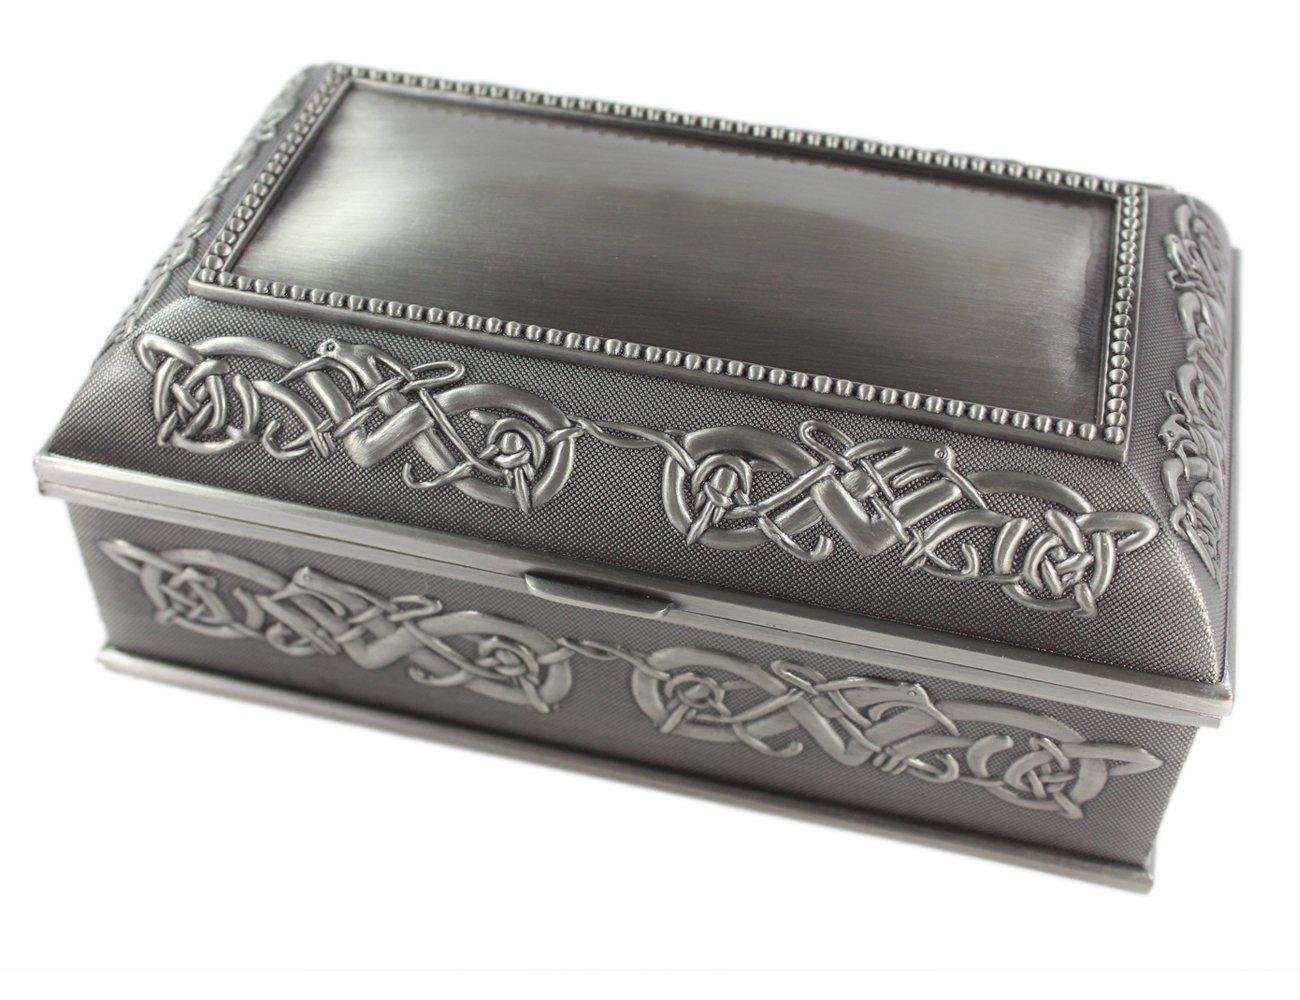 "Irish Jewelry Box Large 7"" x 4"" x 3 ¼"" Pewter Made in Ireland"